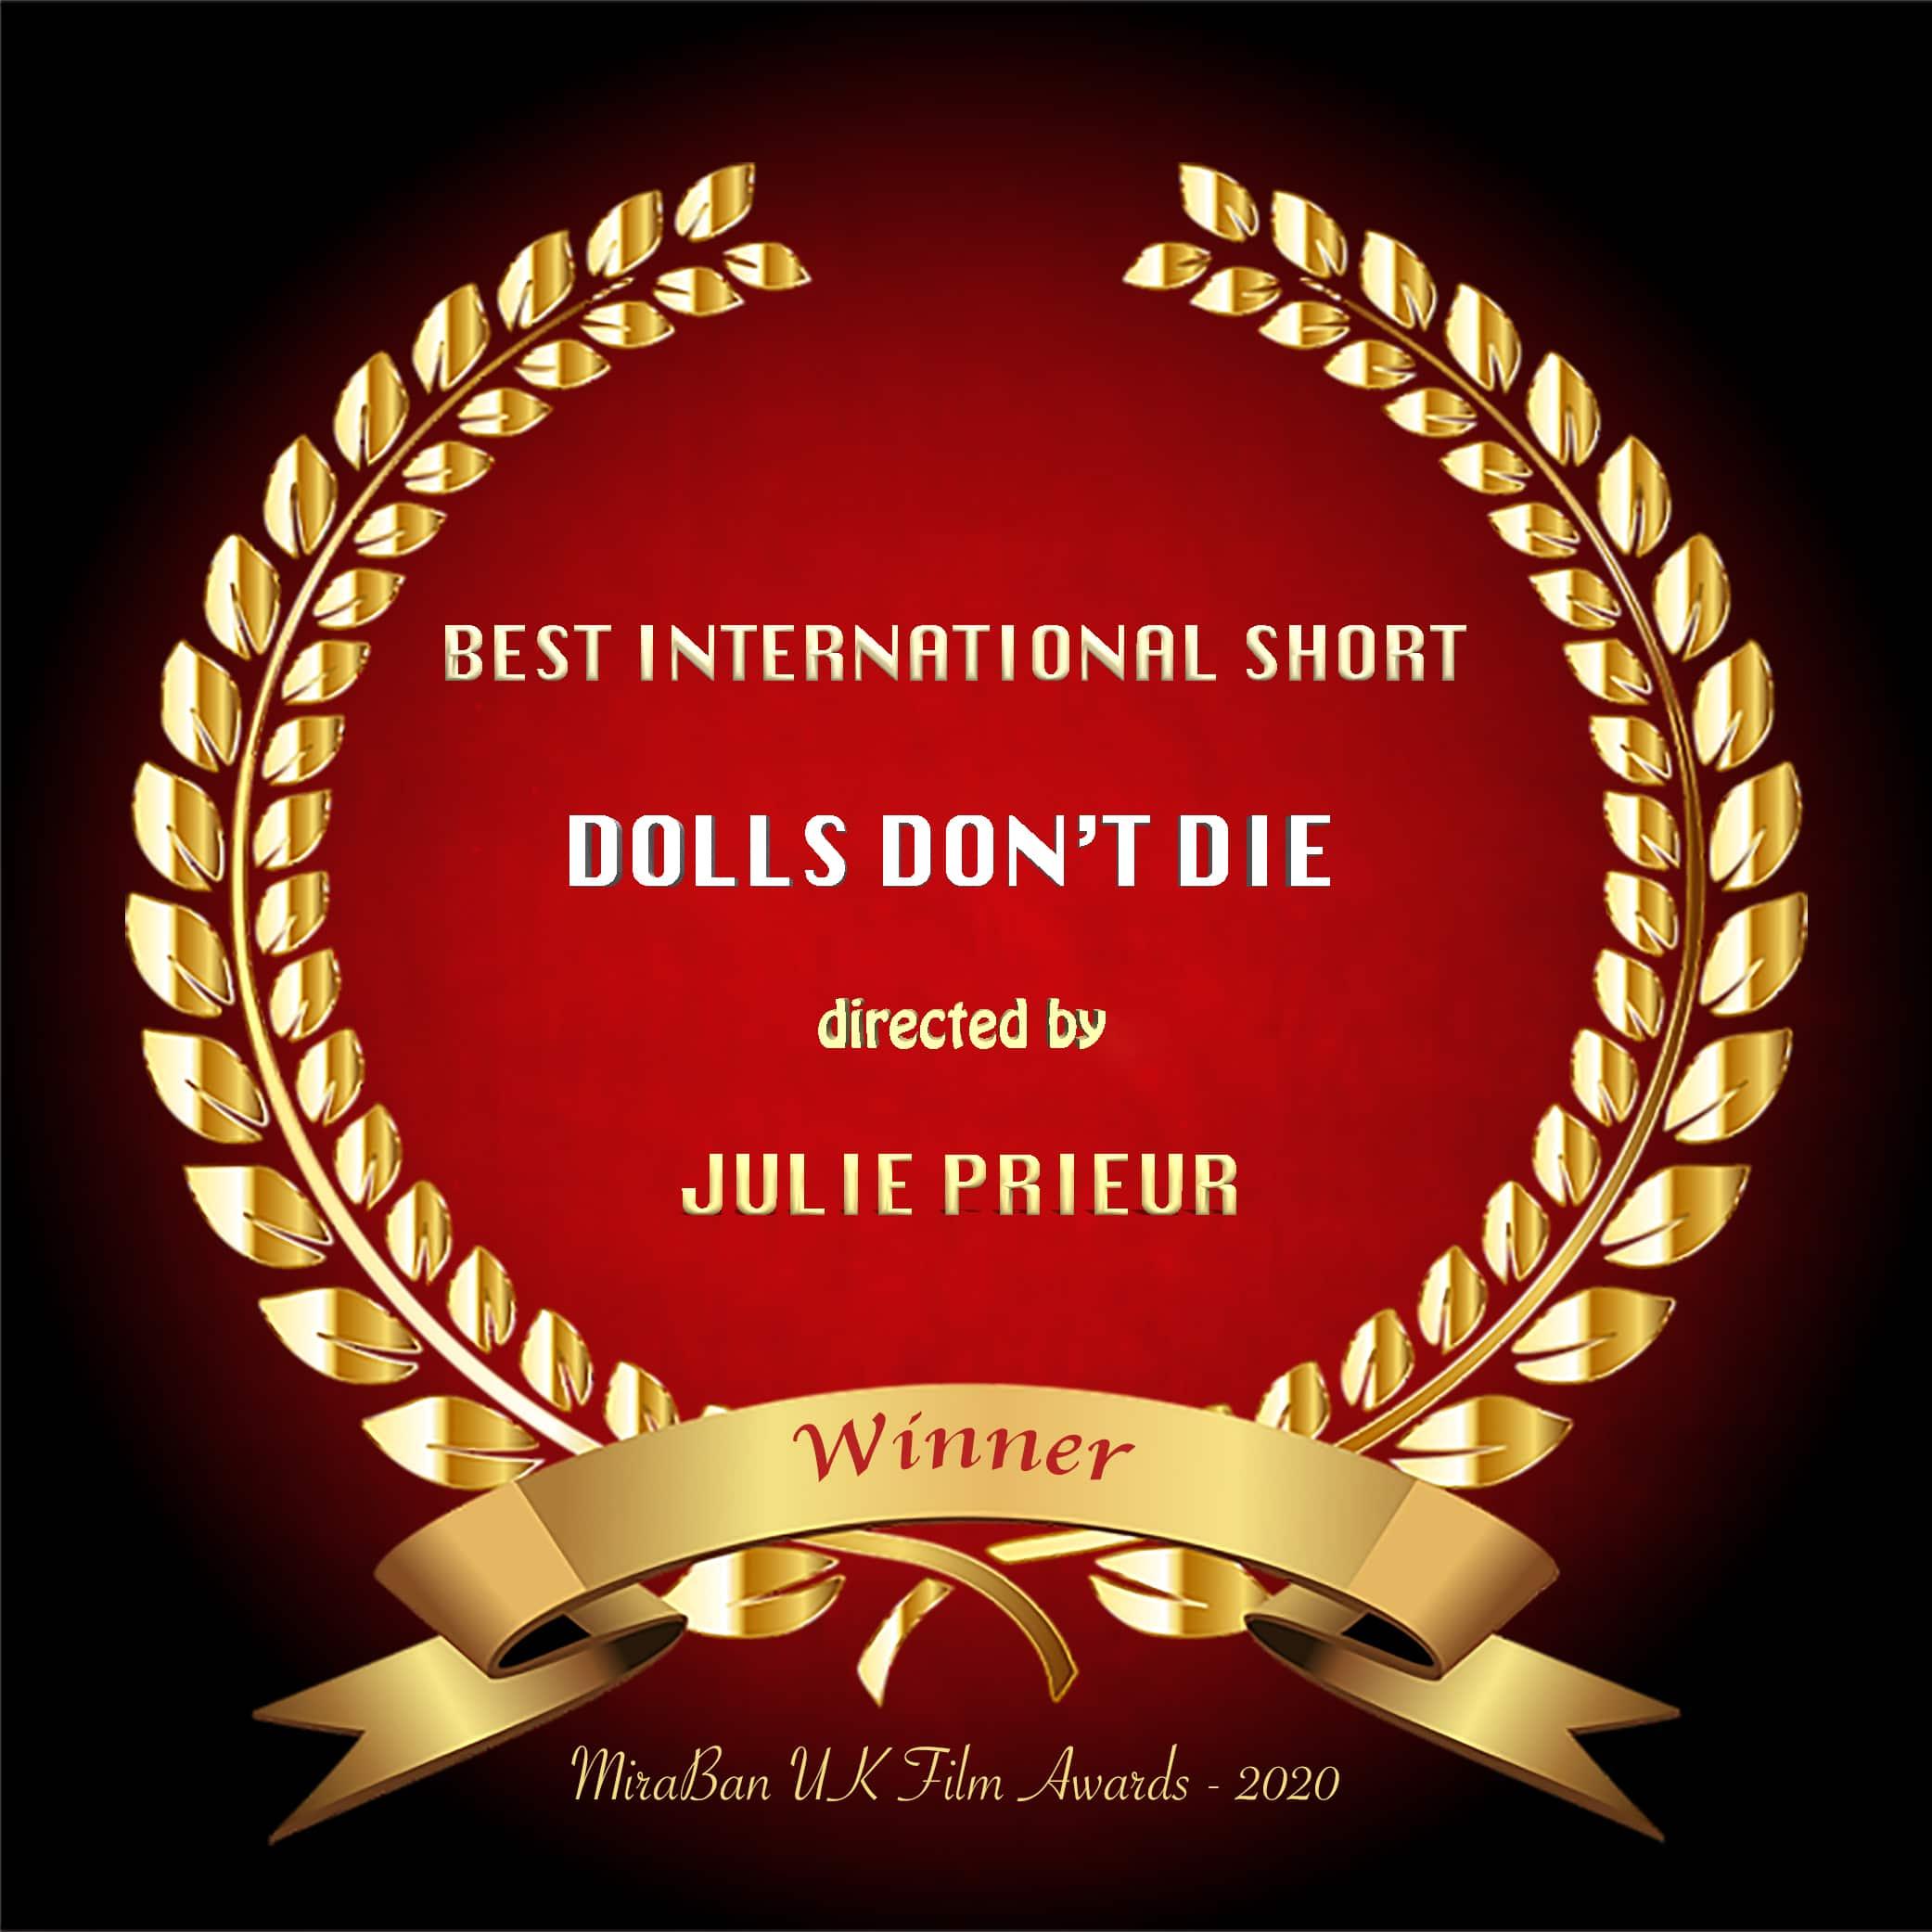 Best International Short